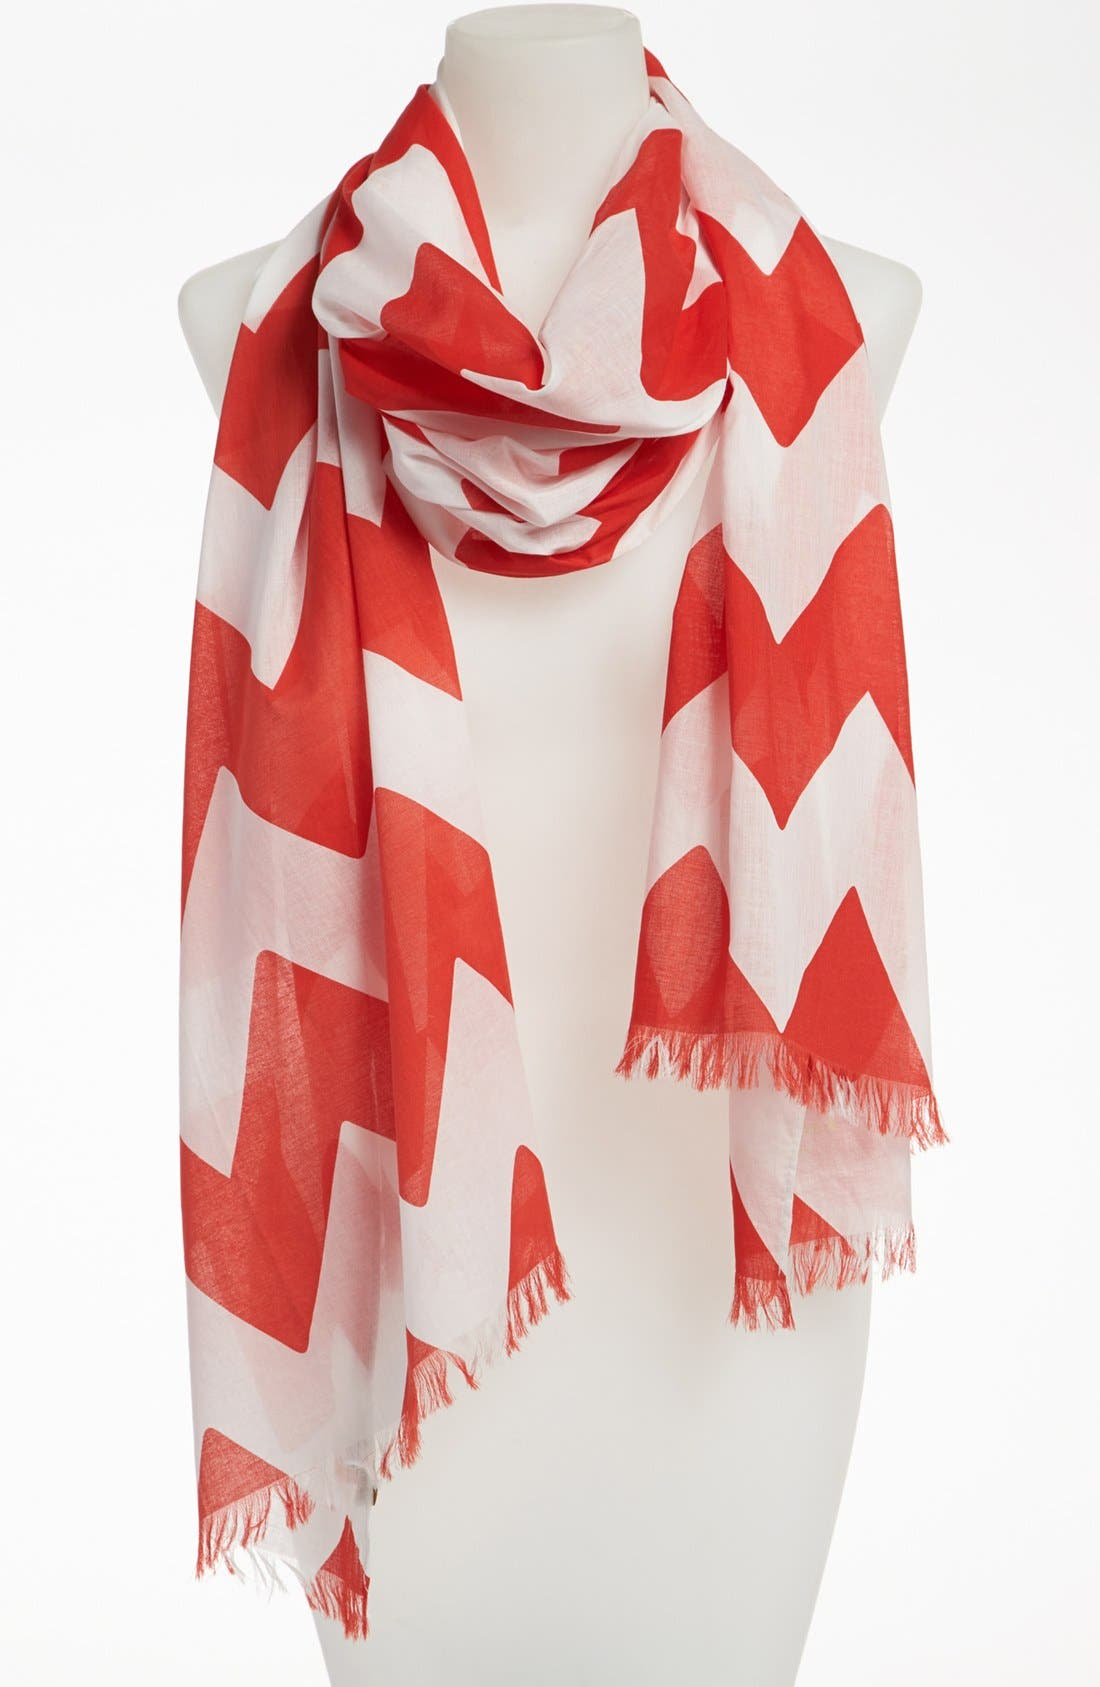 Alternate Image 1 Selected - kate spade new york 'chevron stripe' scarf